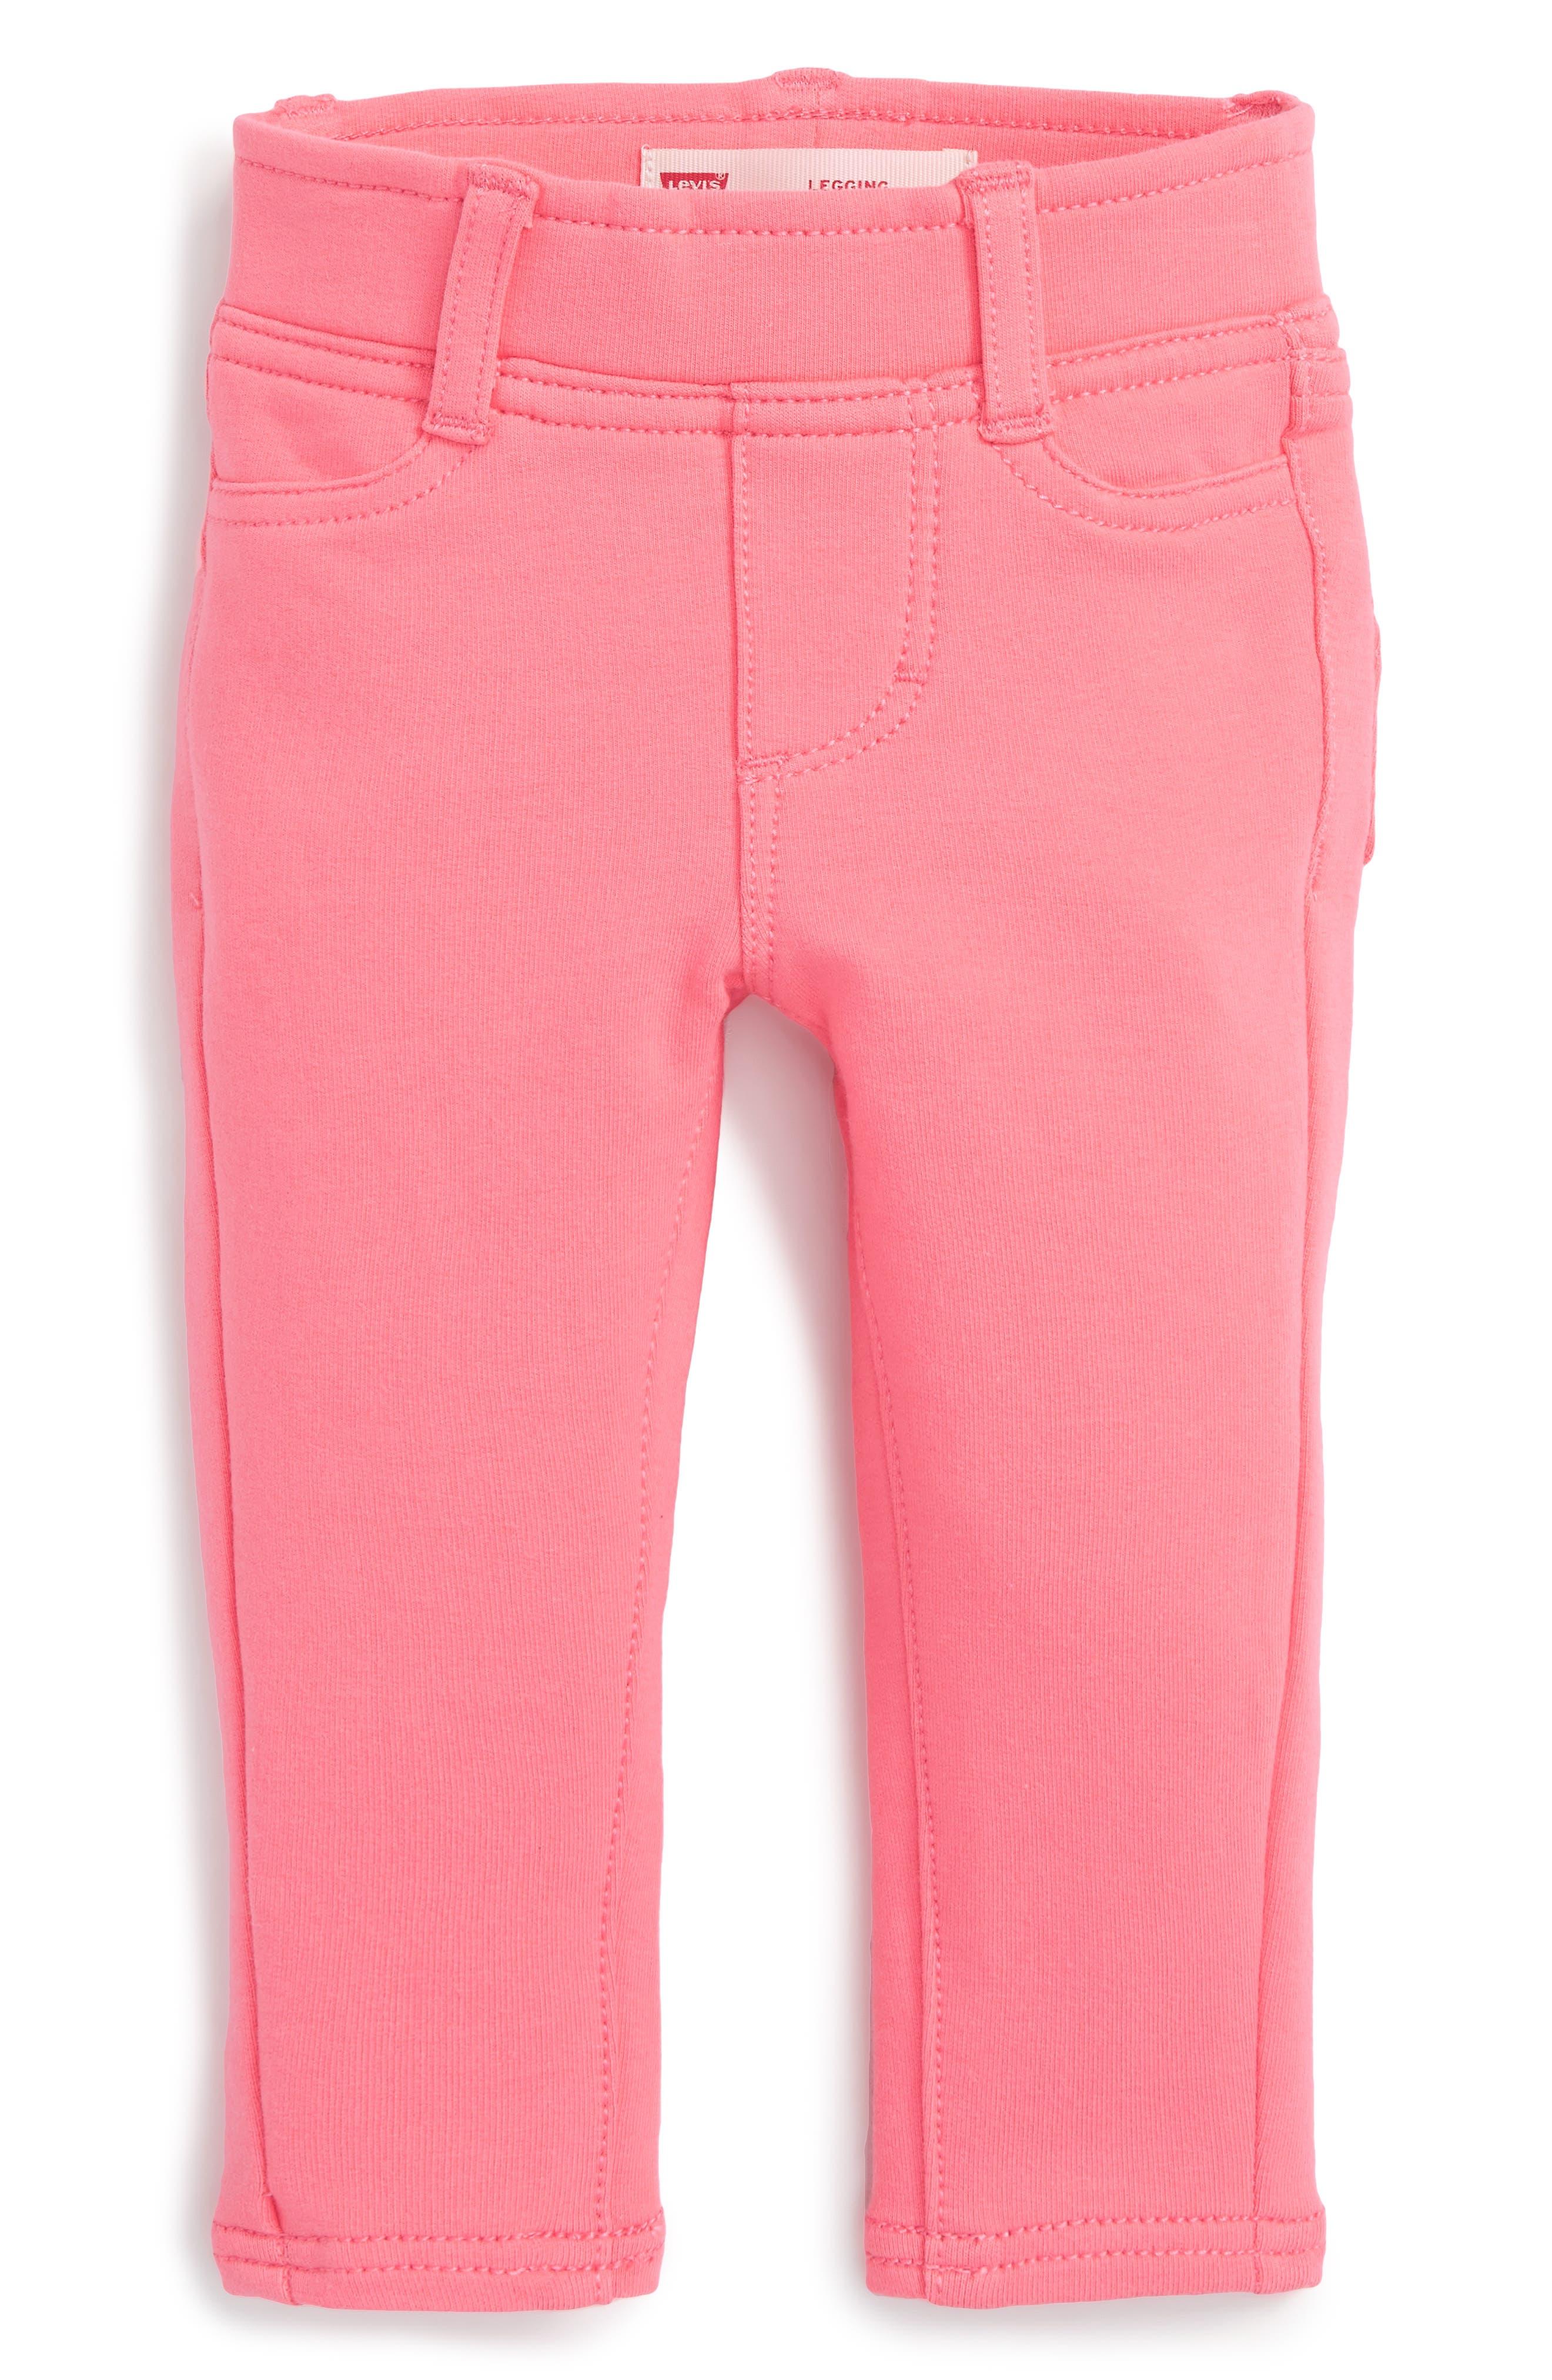 Haley May Leggings,                         Main,                         color, Strawberry Pink